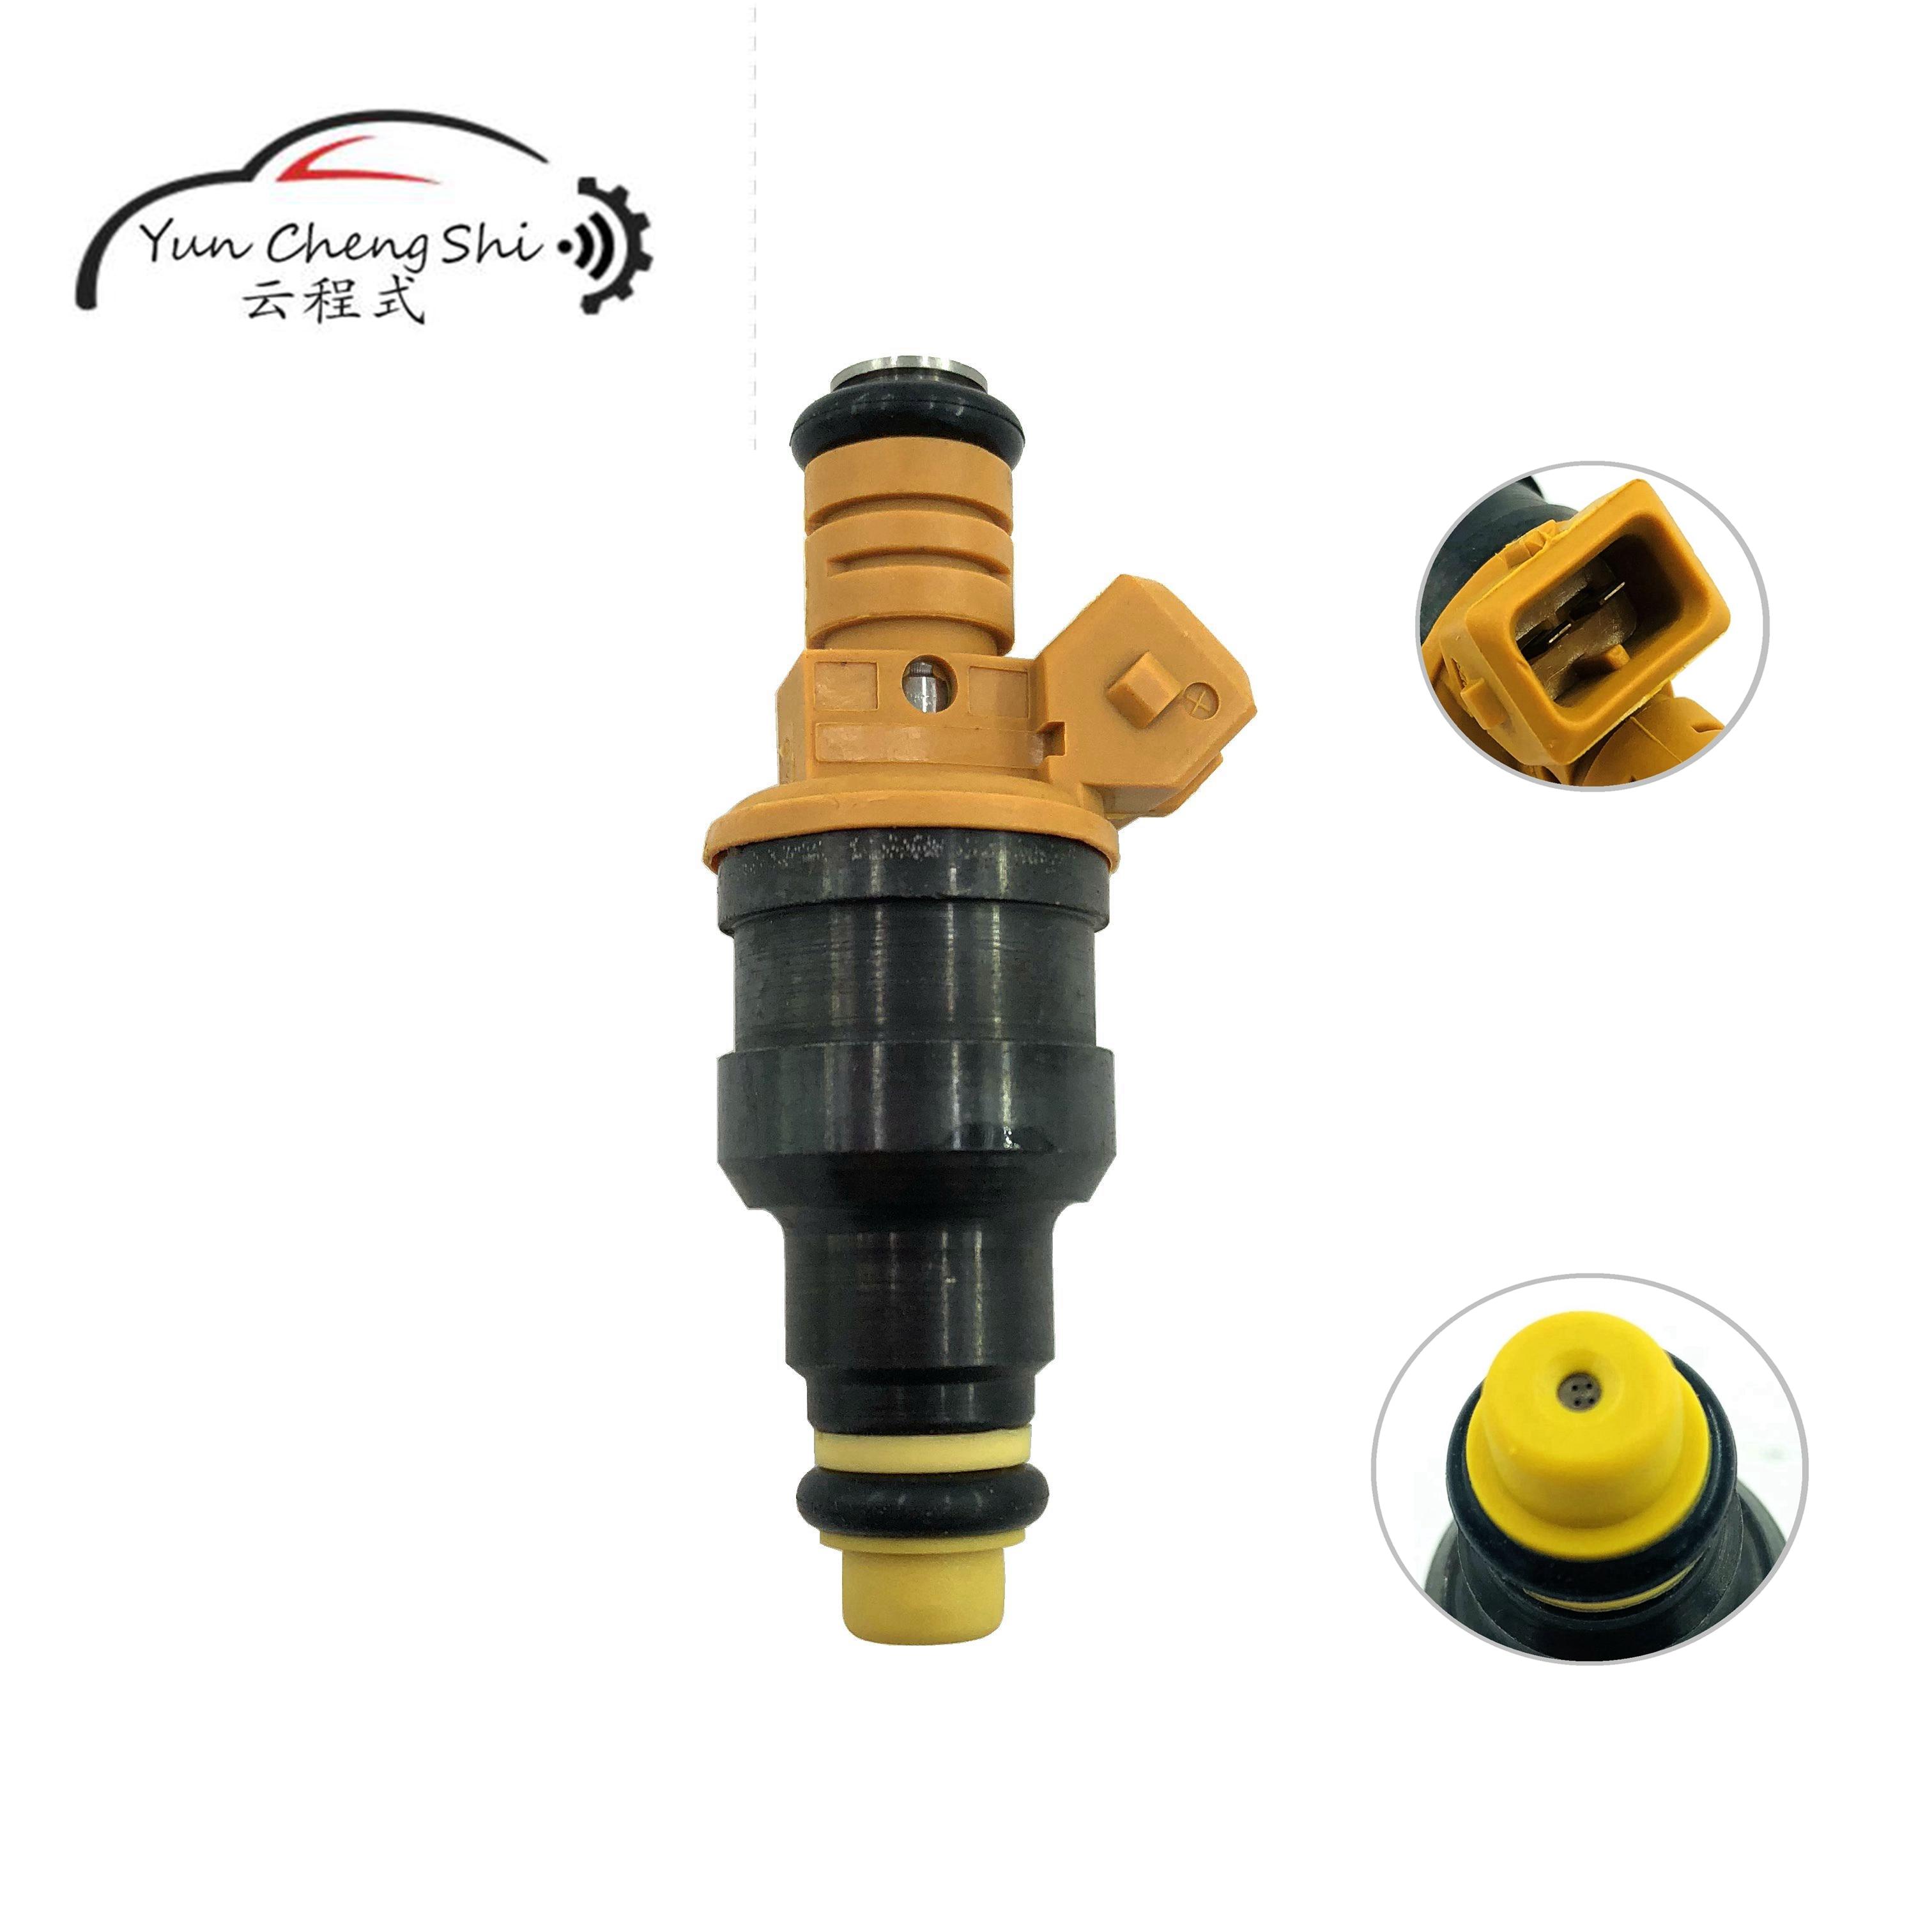 8 pcs 0280150718 Fuel Injector For Ford E-150 F-250 E-350 F-350 F-150  V8 5.4L